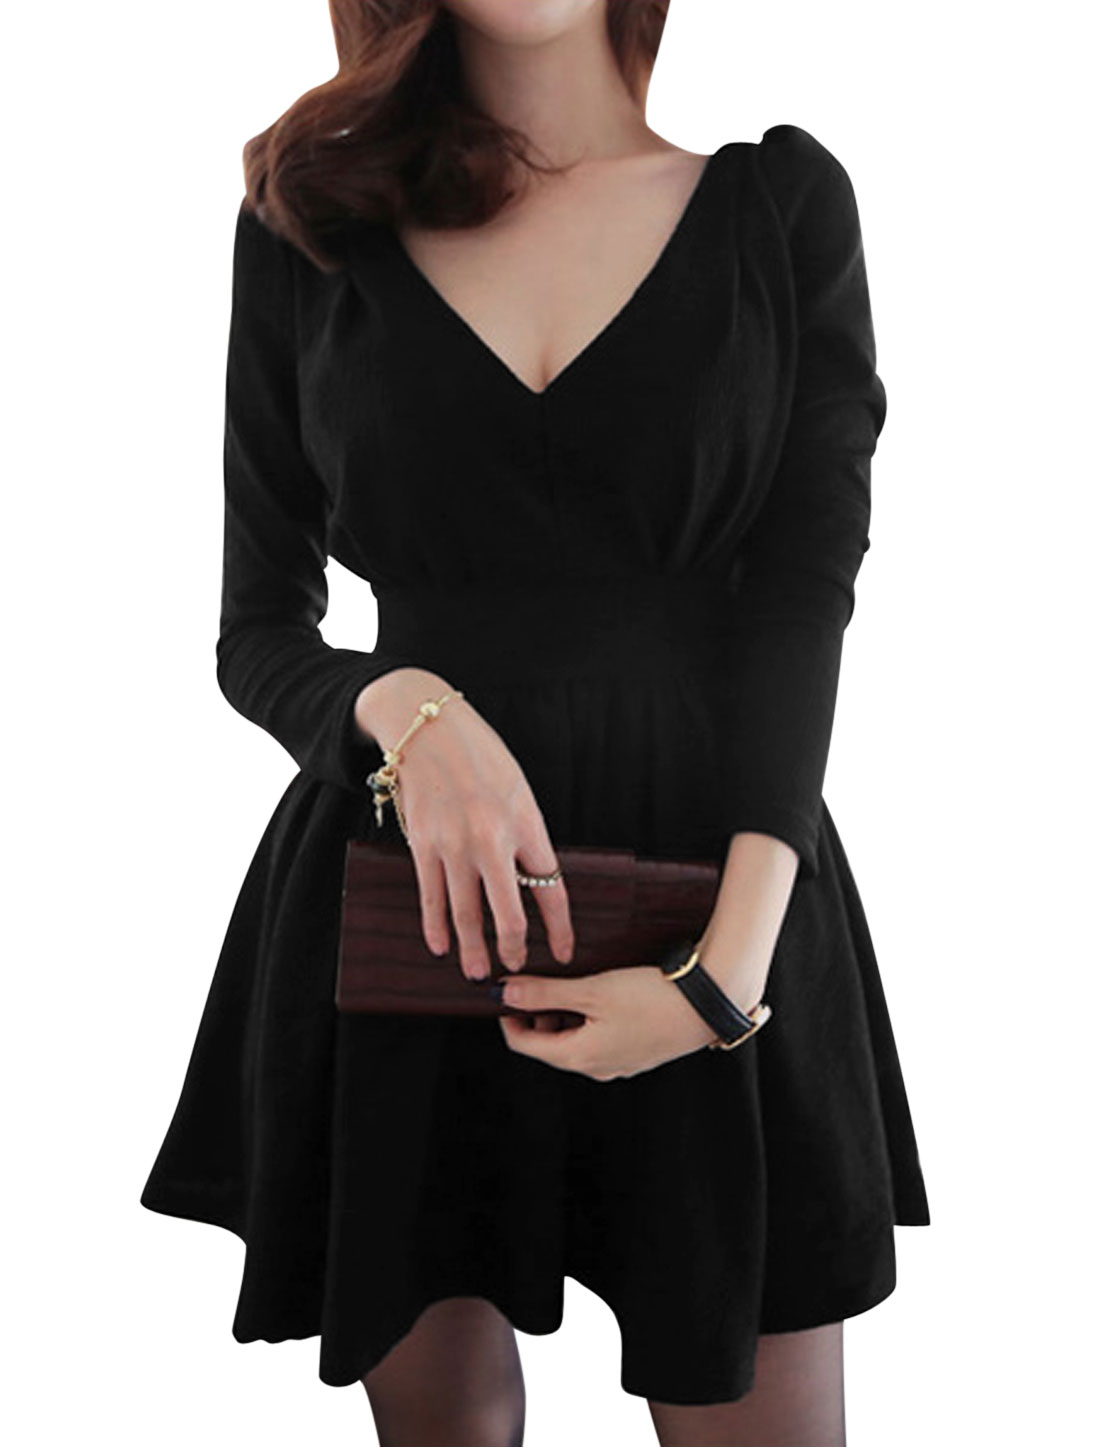 Ladies Black Pullover Ruched Detail Zip Up Front V Back leisure Dress M